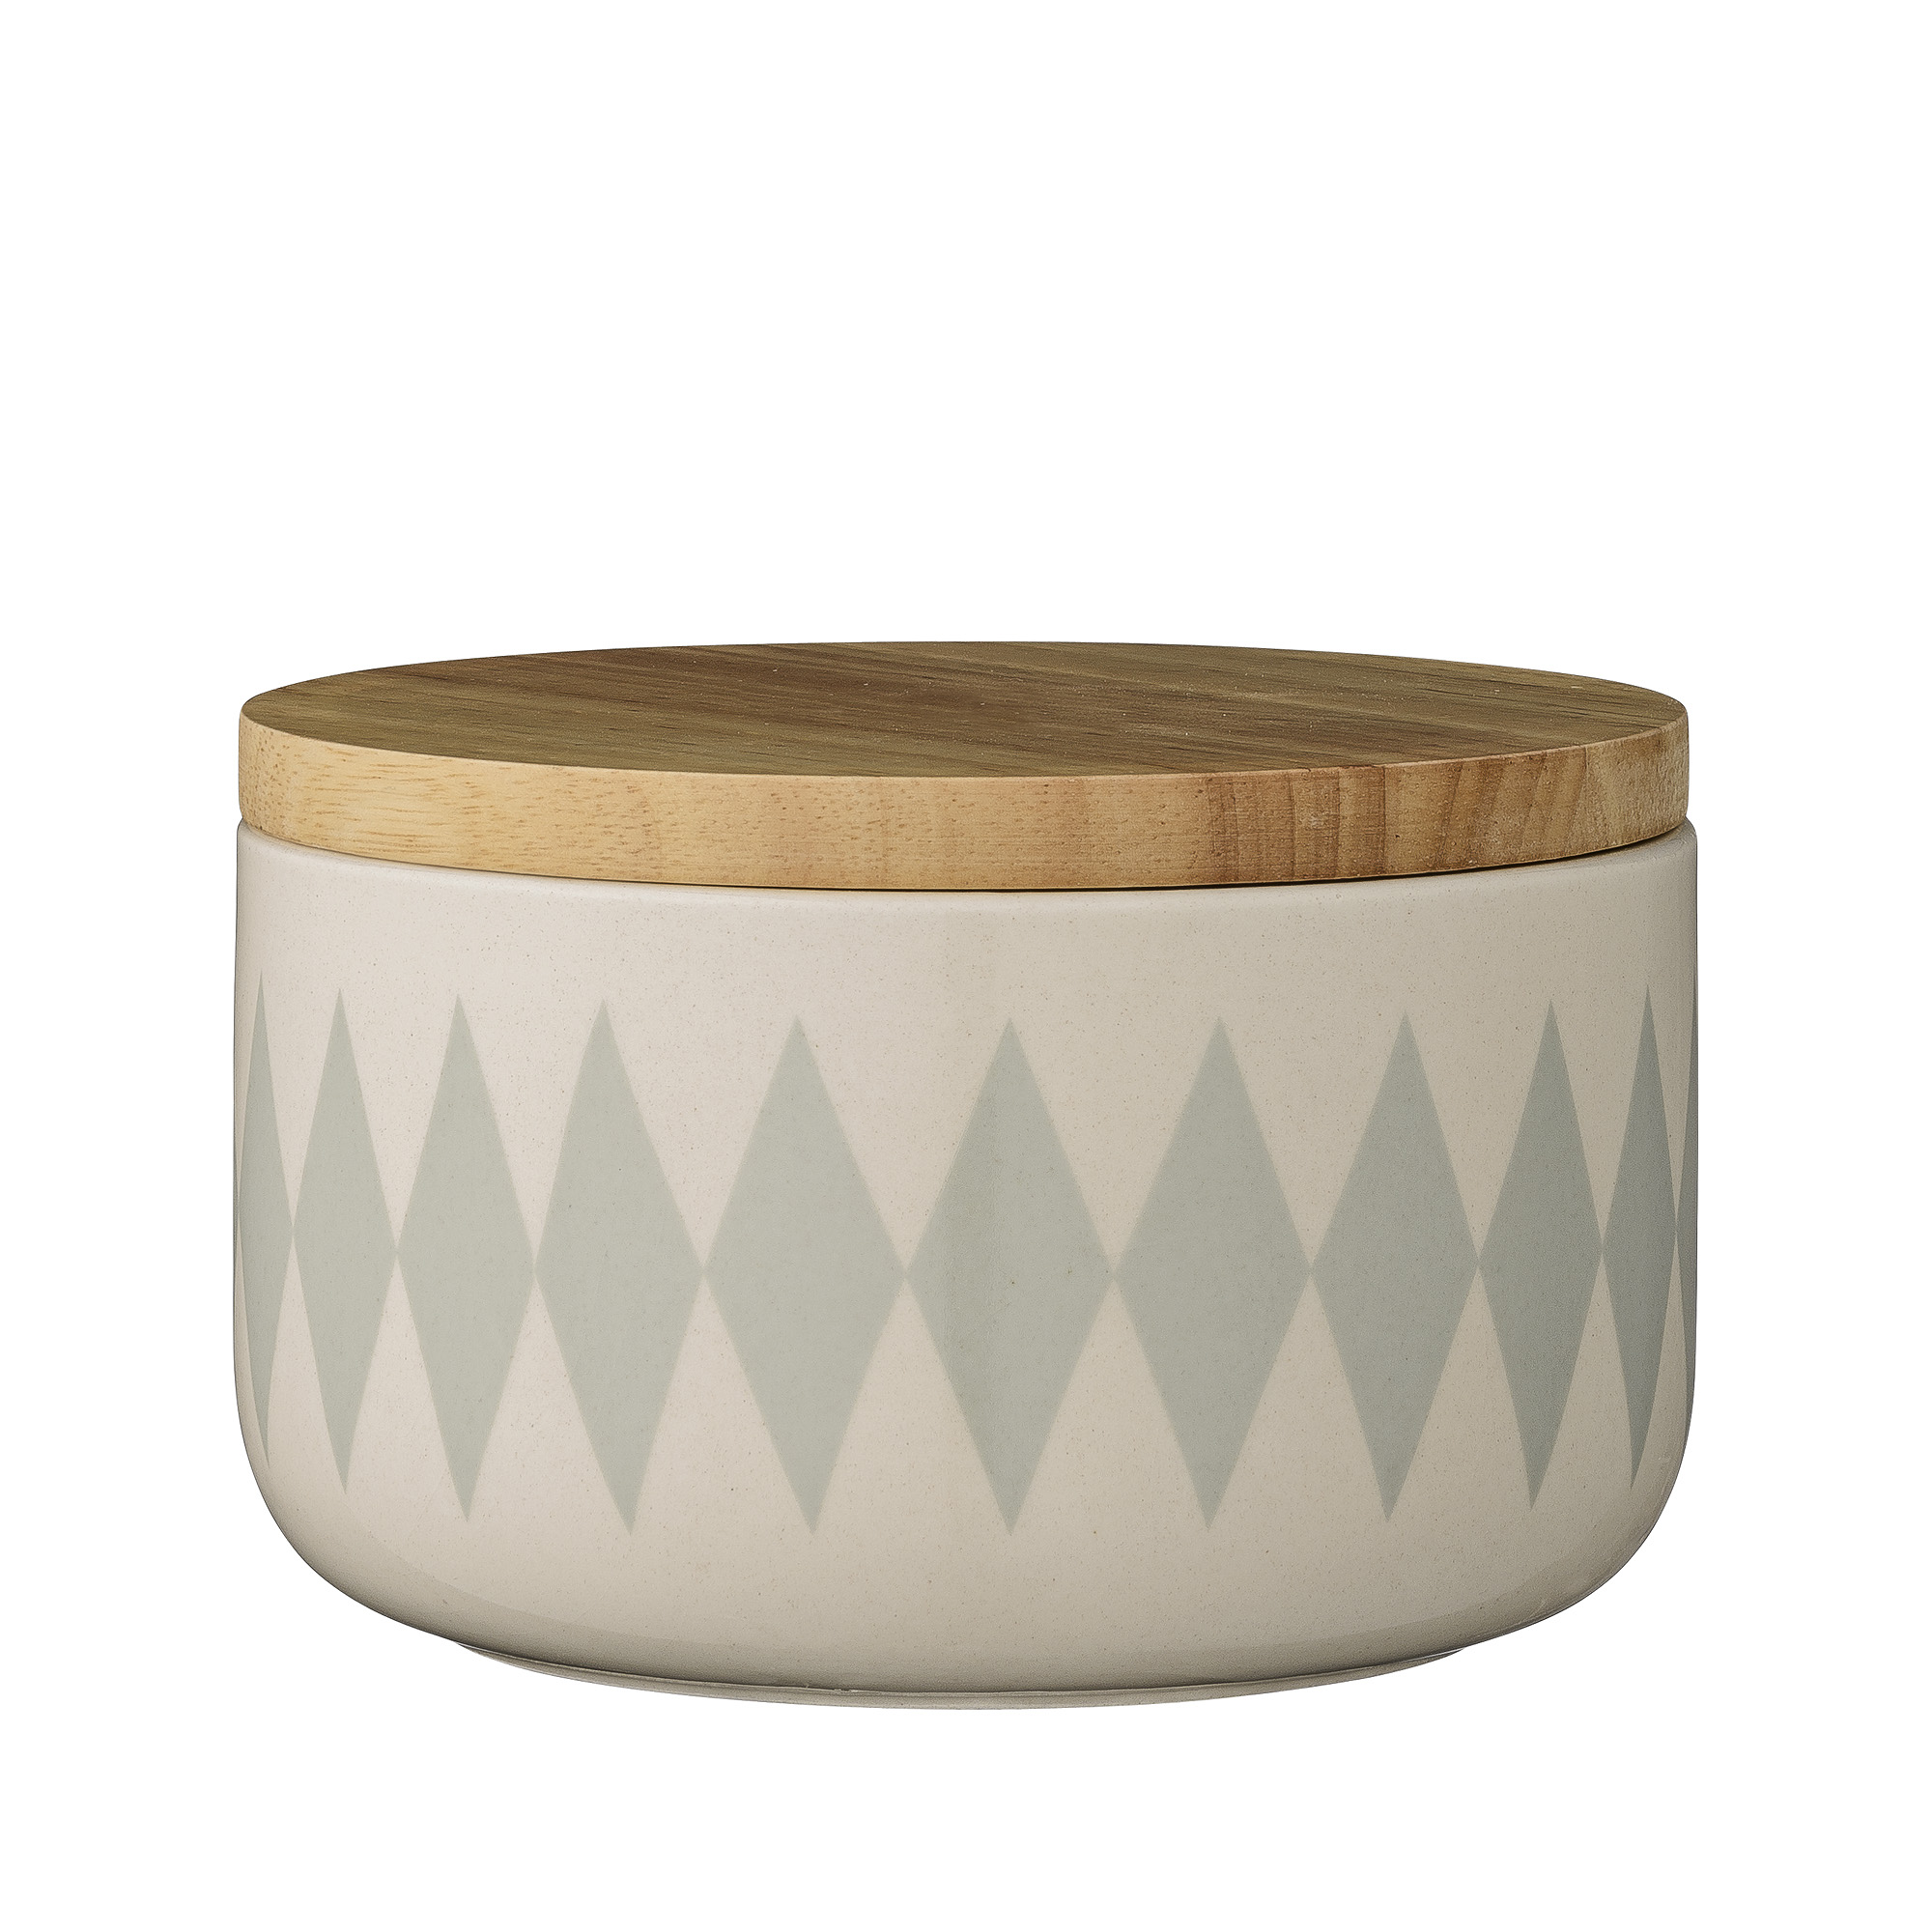 pot de cuisine losange mm. Black Bedroom Furniture Sets. Home Design Ideas